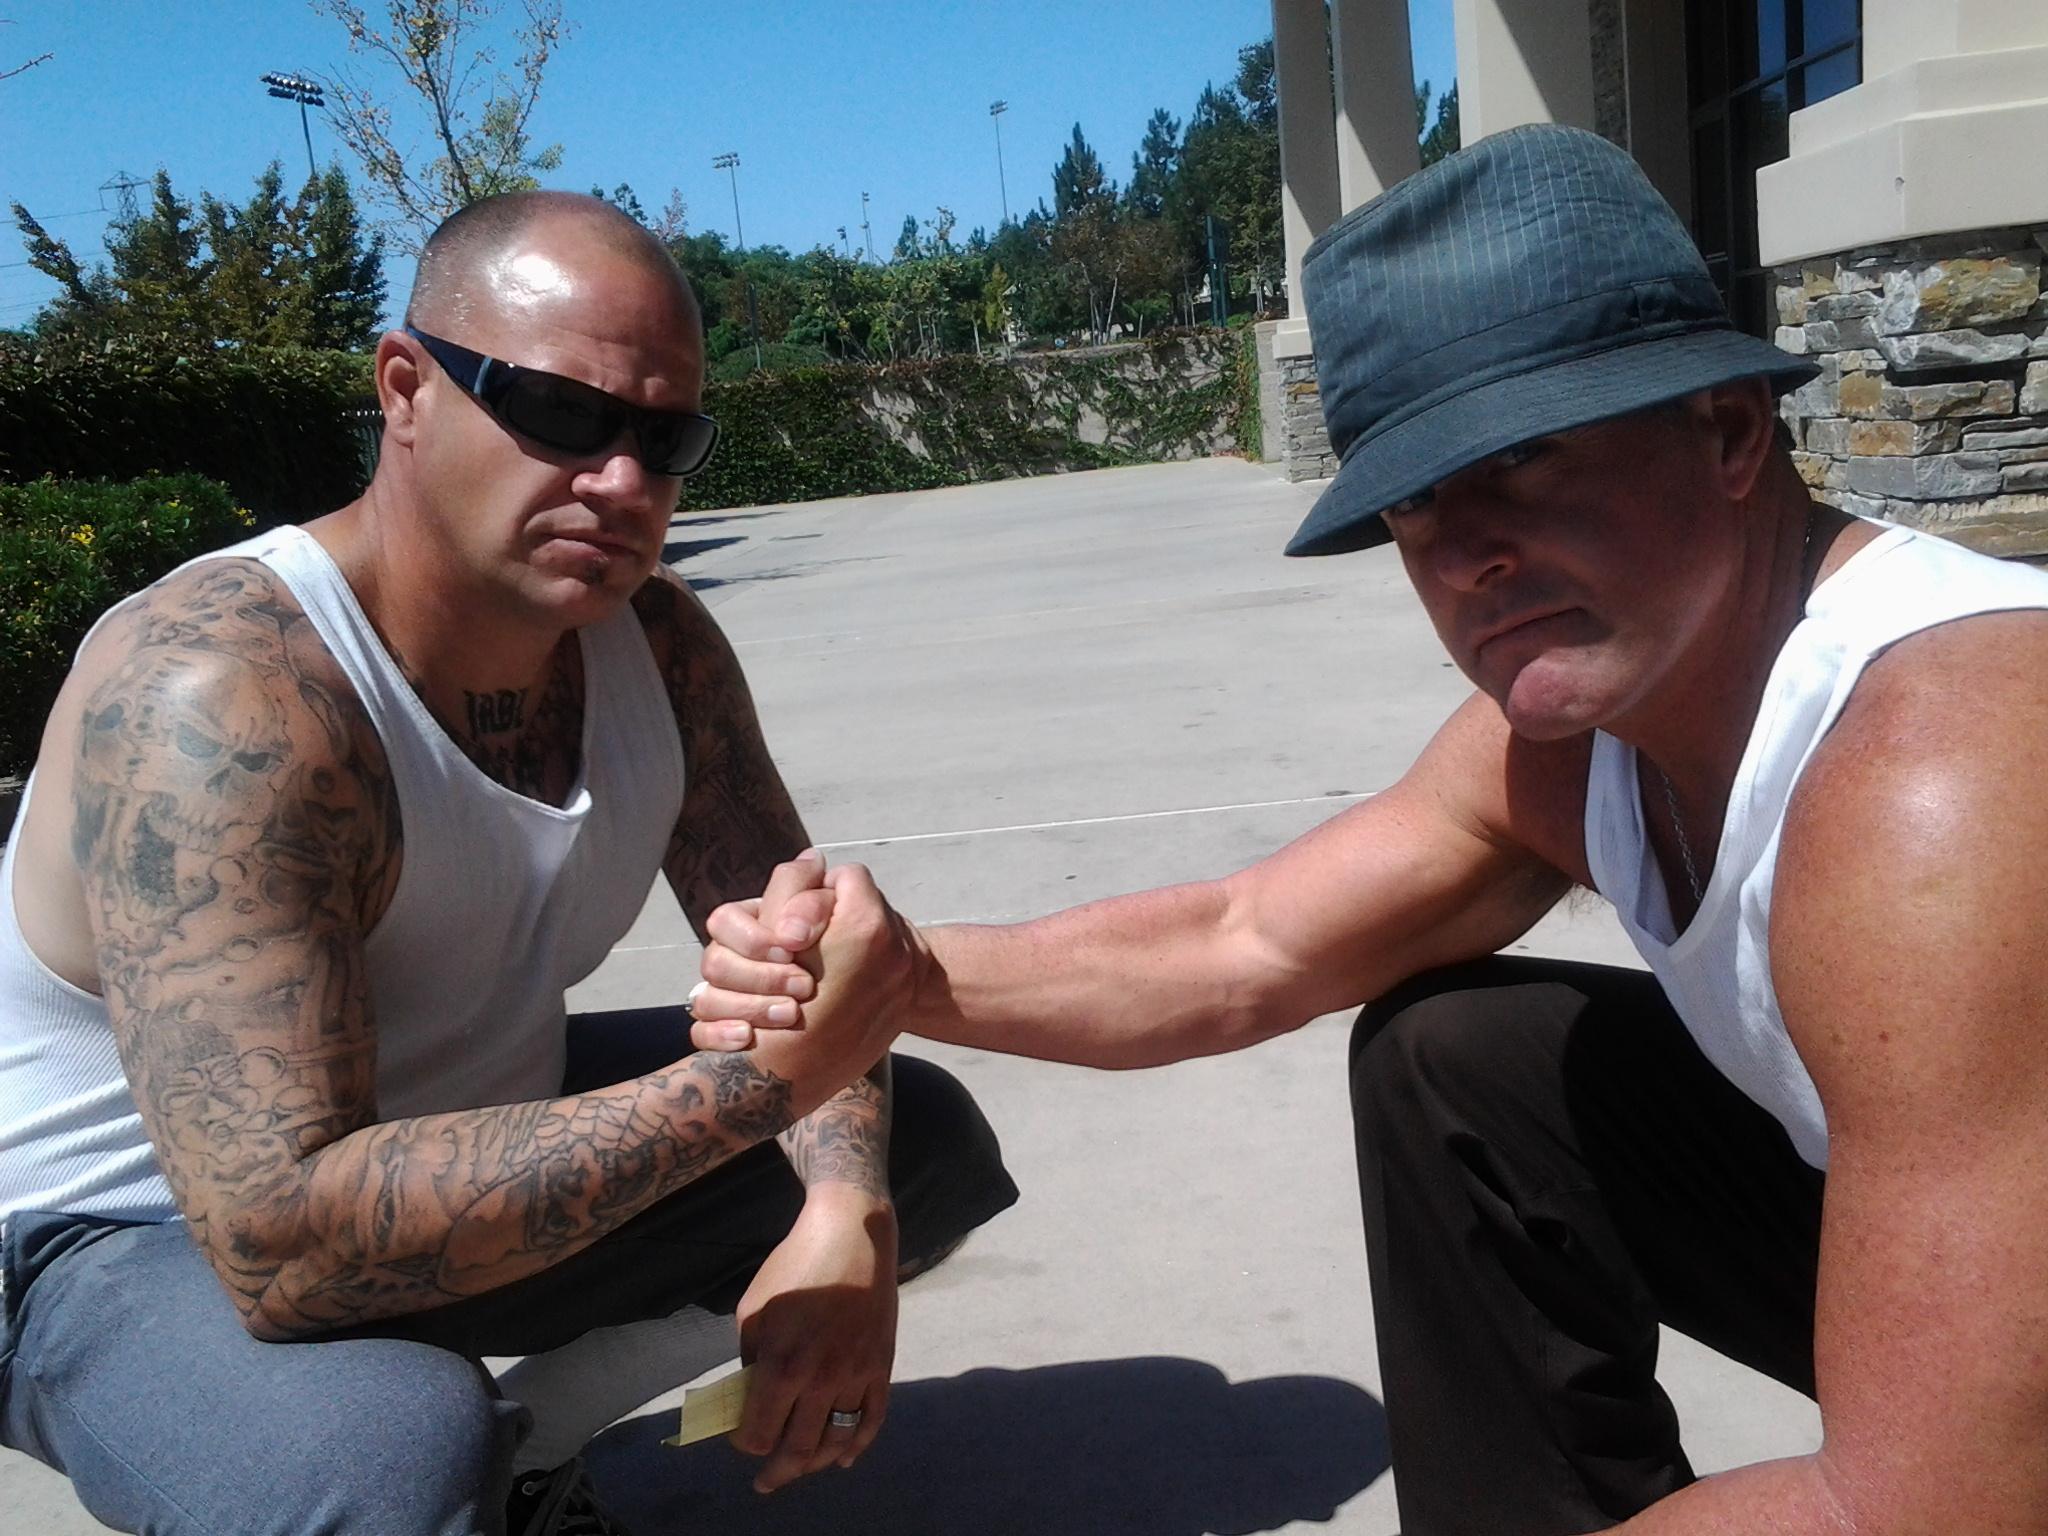 prison essay pixels gangs in the prison system essay medoblakocom